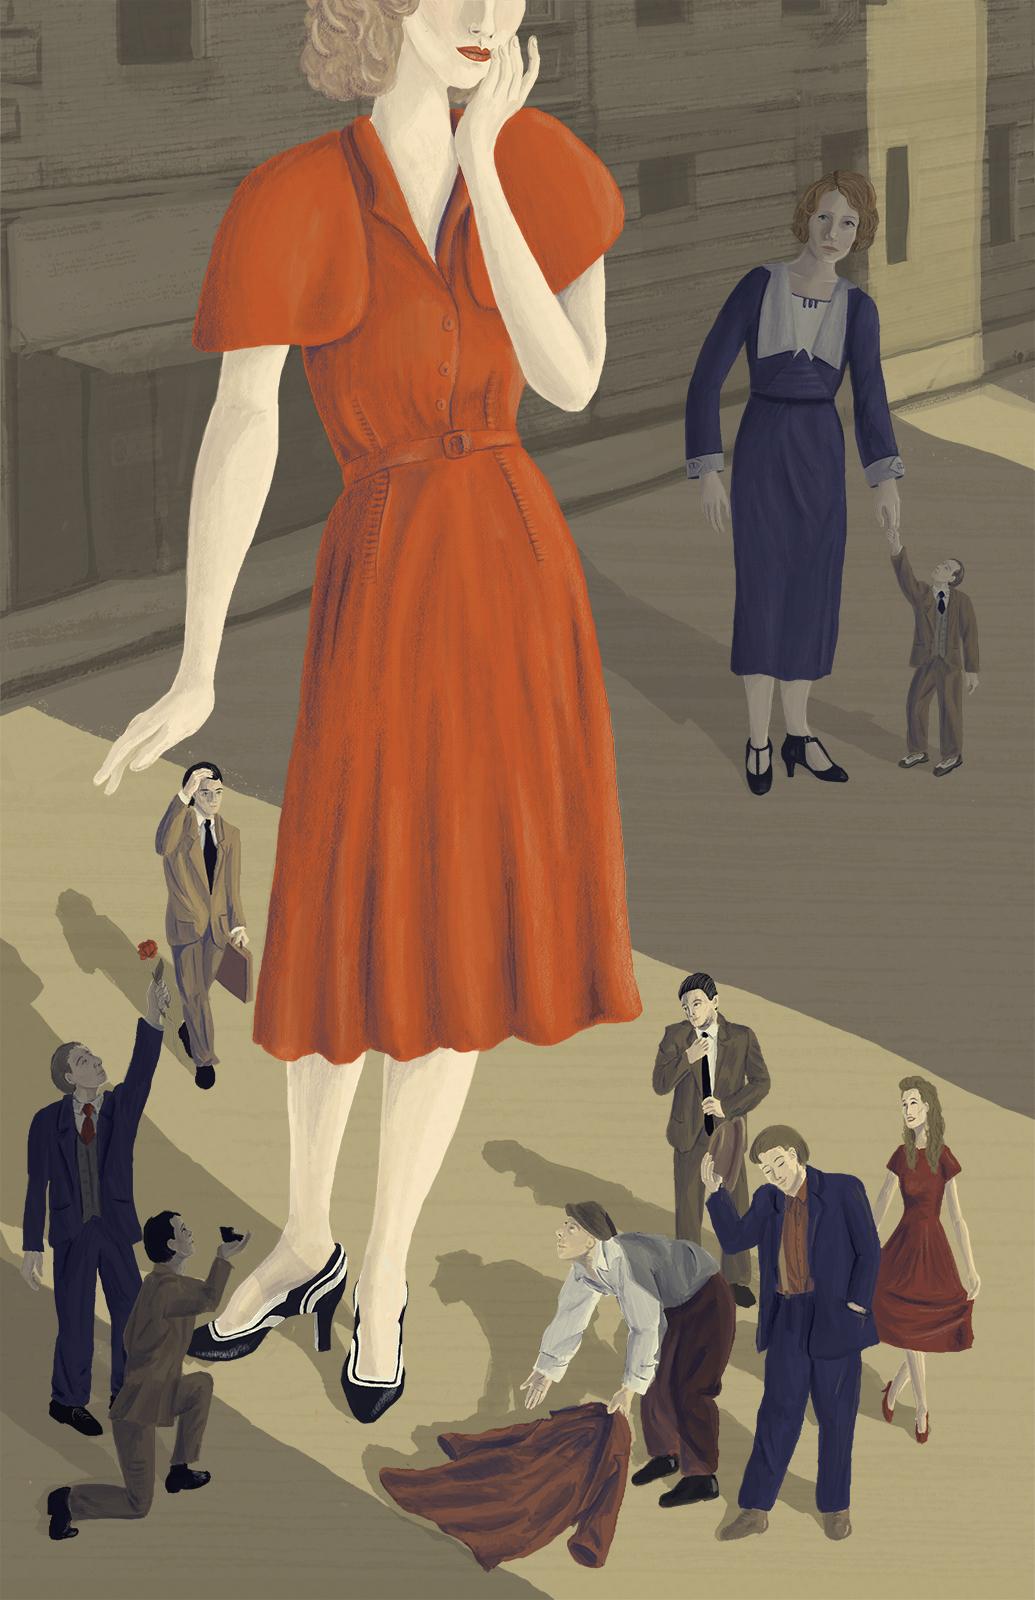 Illustration by Michelle Schofield